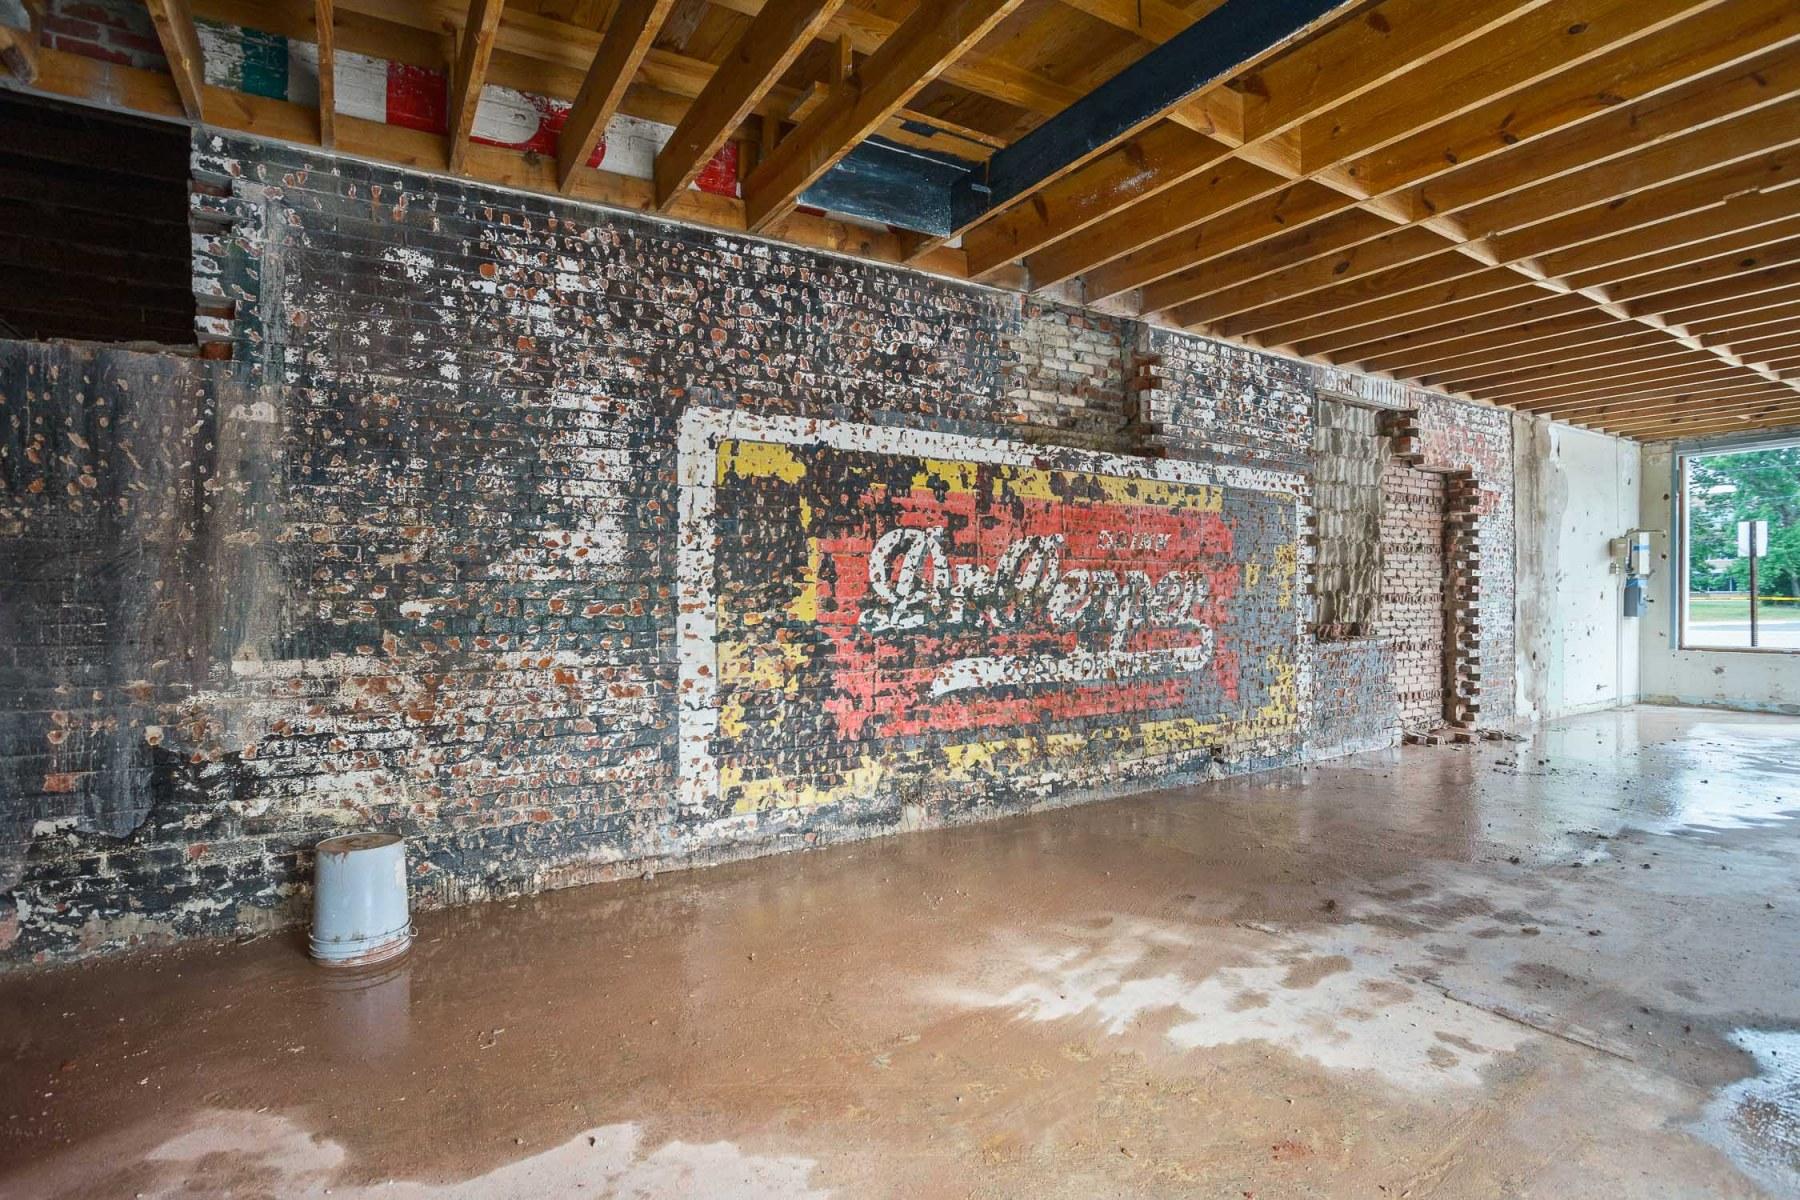 Horizons-East-Office-Renovation-1st-Set-27May2021_SB_01272_web-size